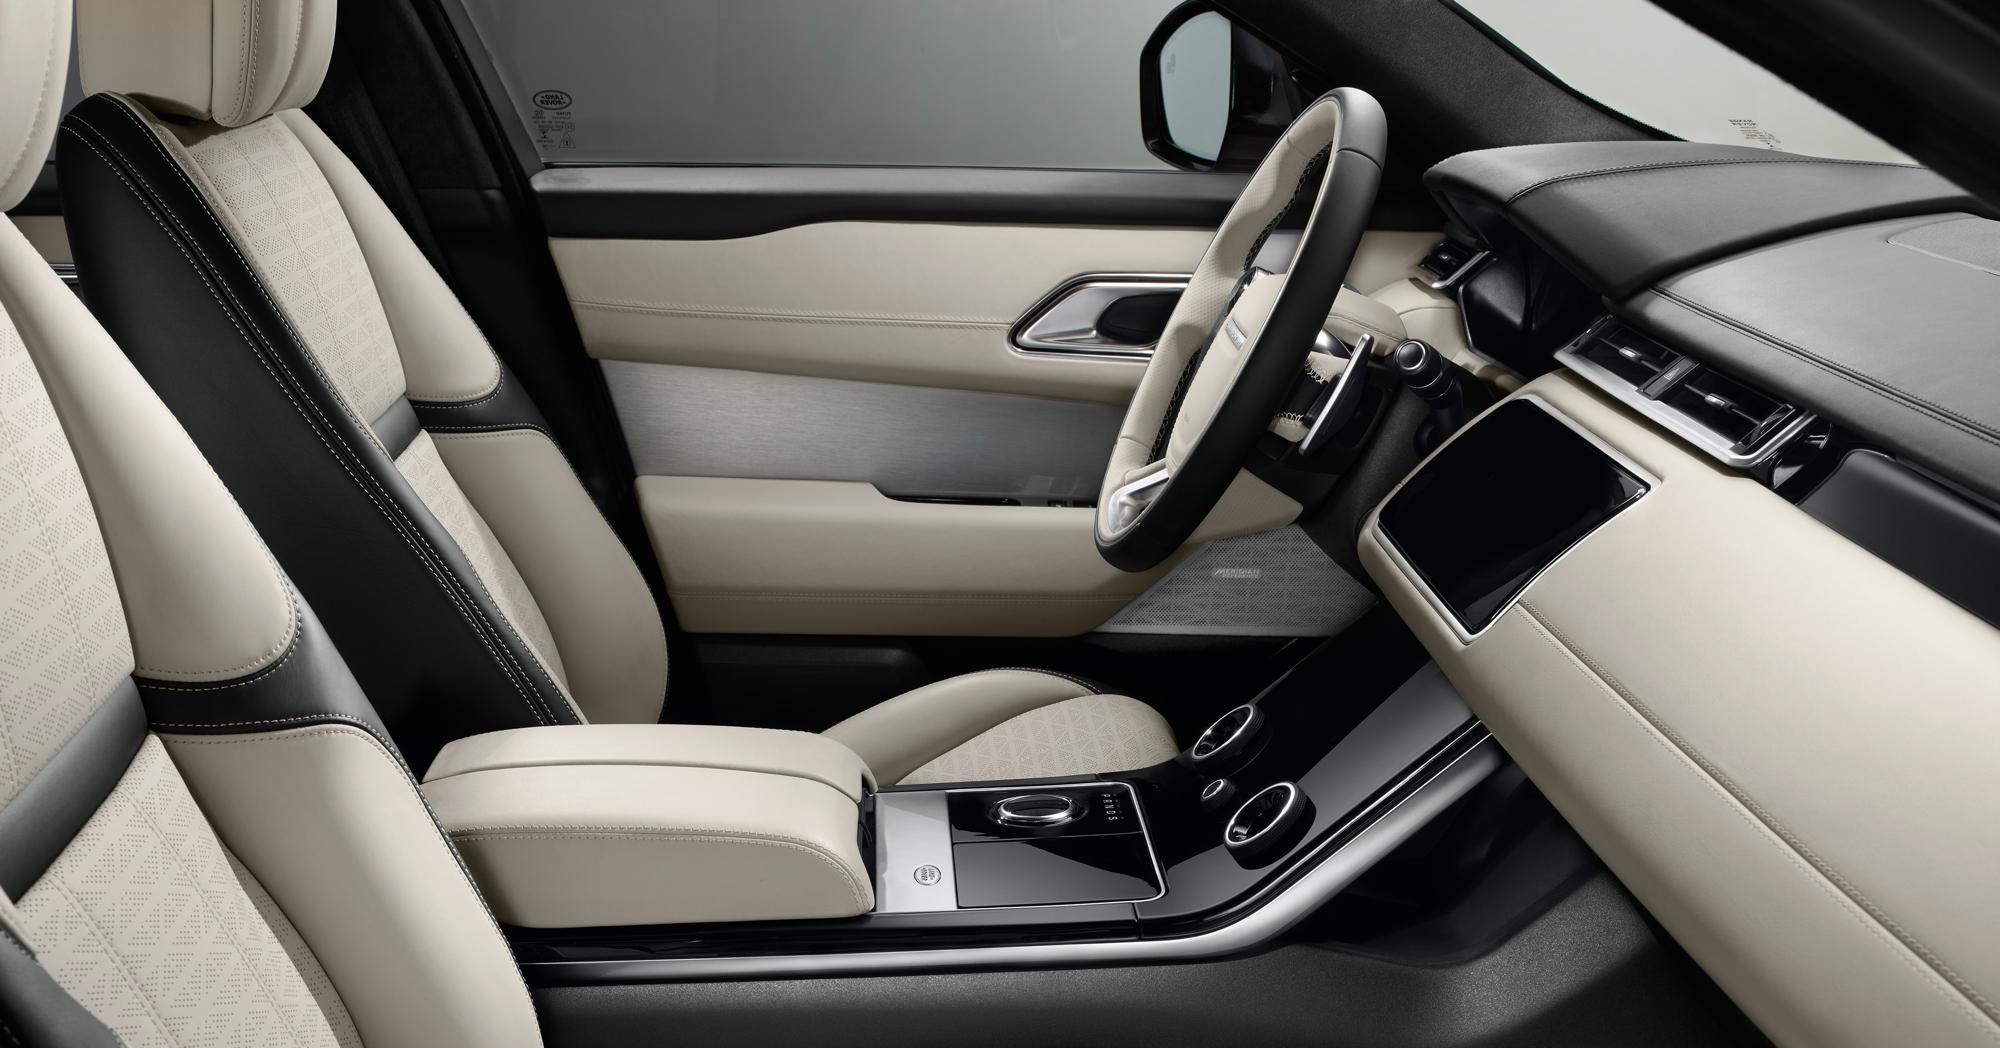 Range Rover Velar centre console